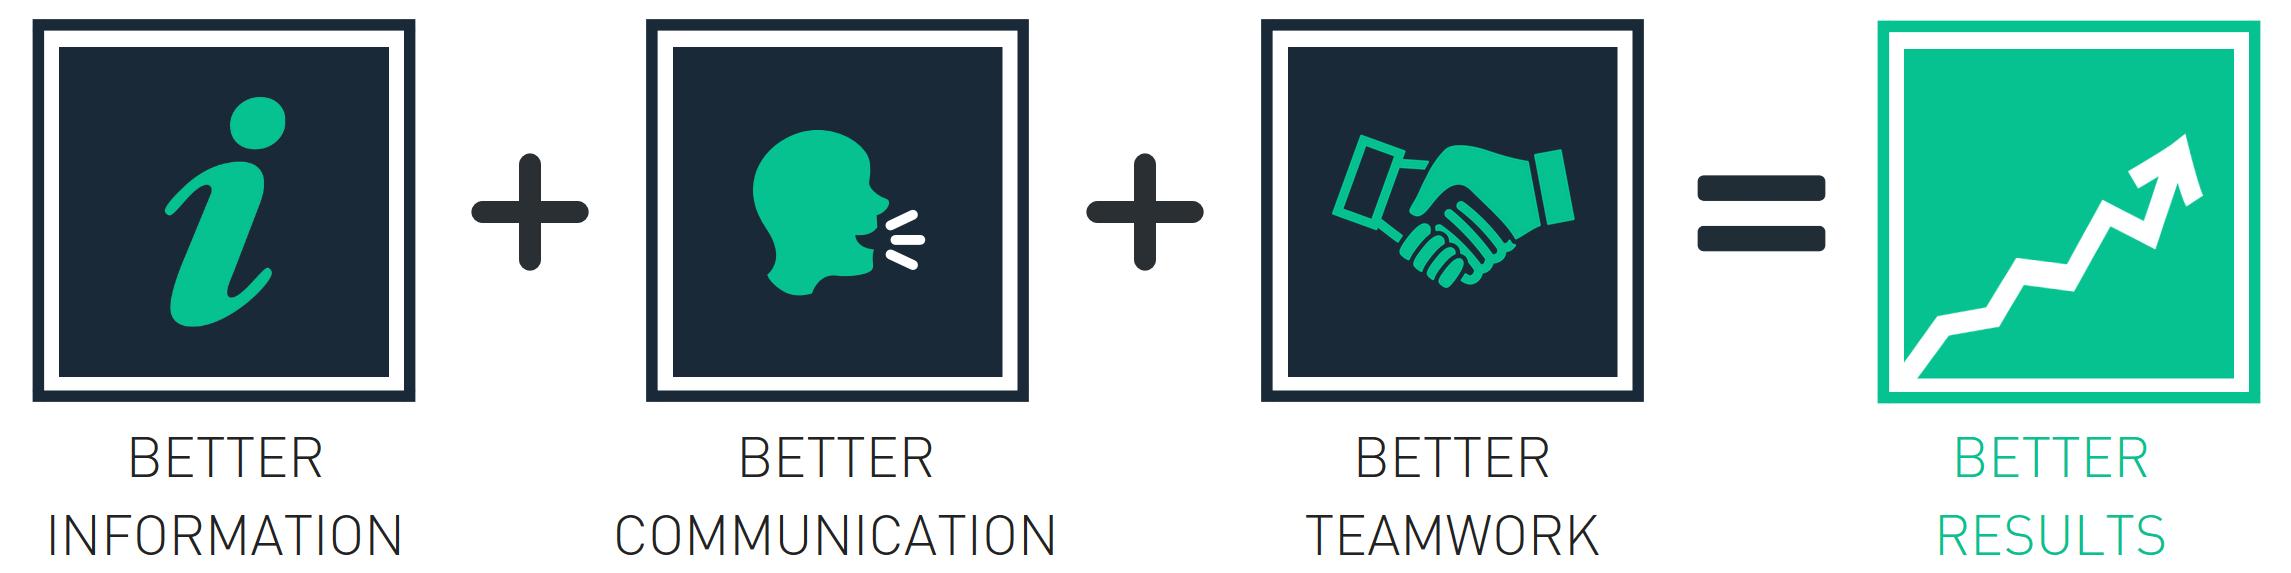 Better Information, Better Communication and Better Teamwork means better results